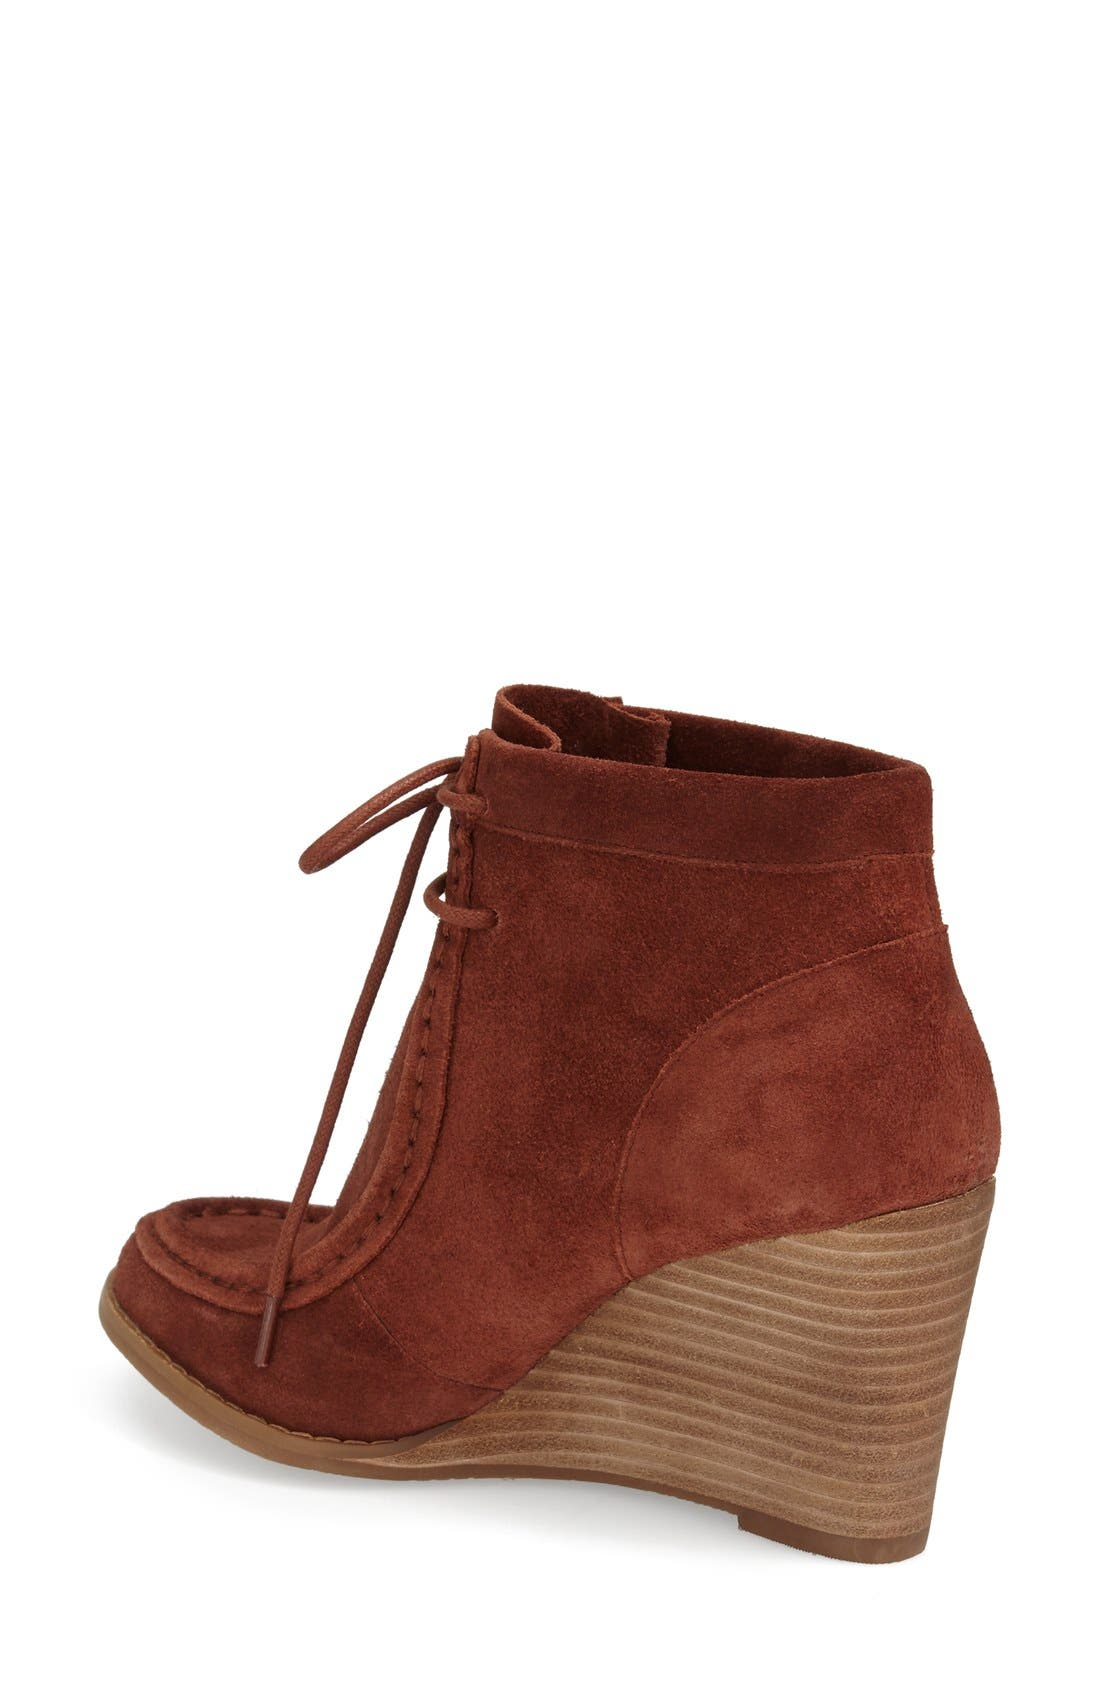 Alternate Image 2  - Lucky Brand 'Ysabel' Wedge Chukka Boot (Women)